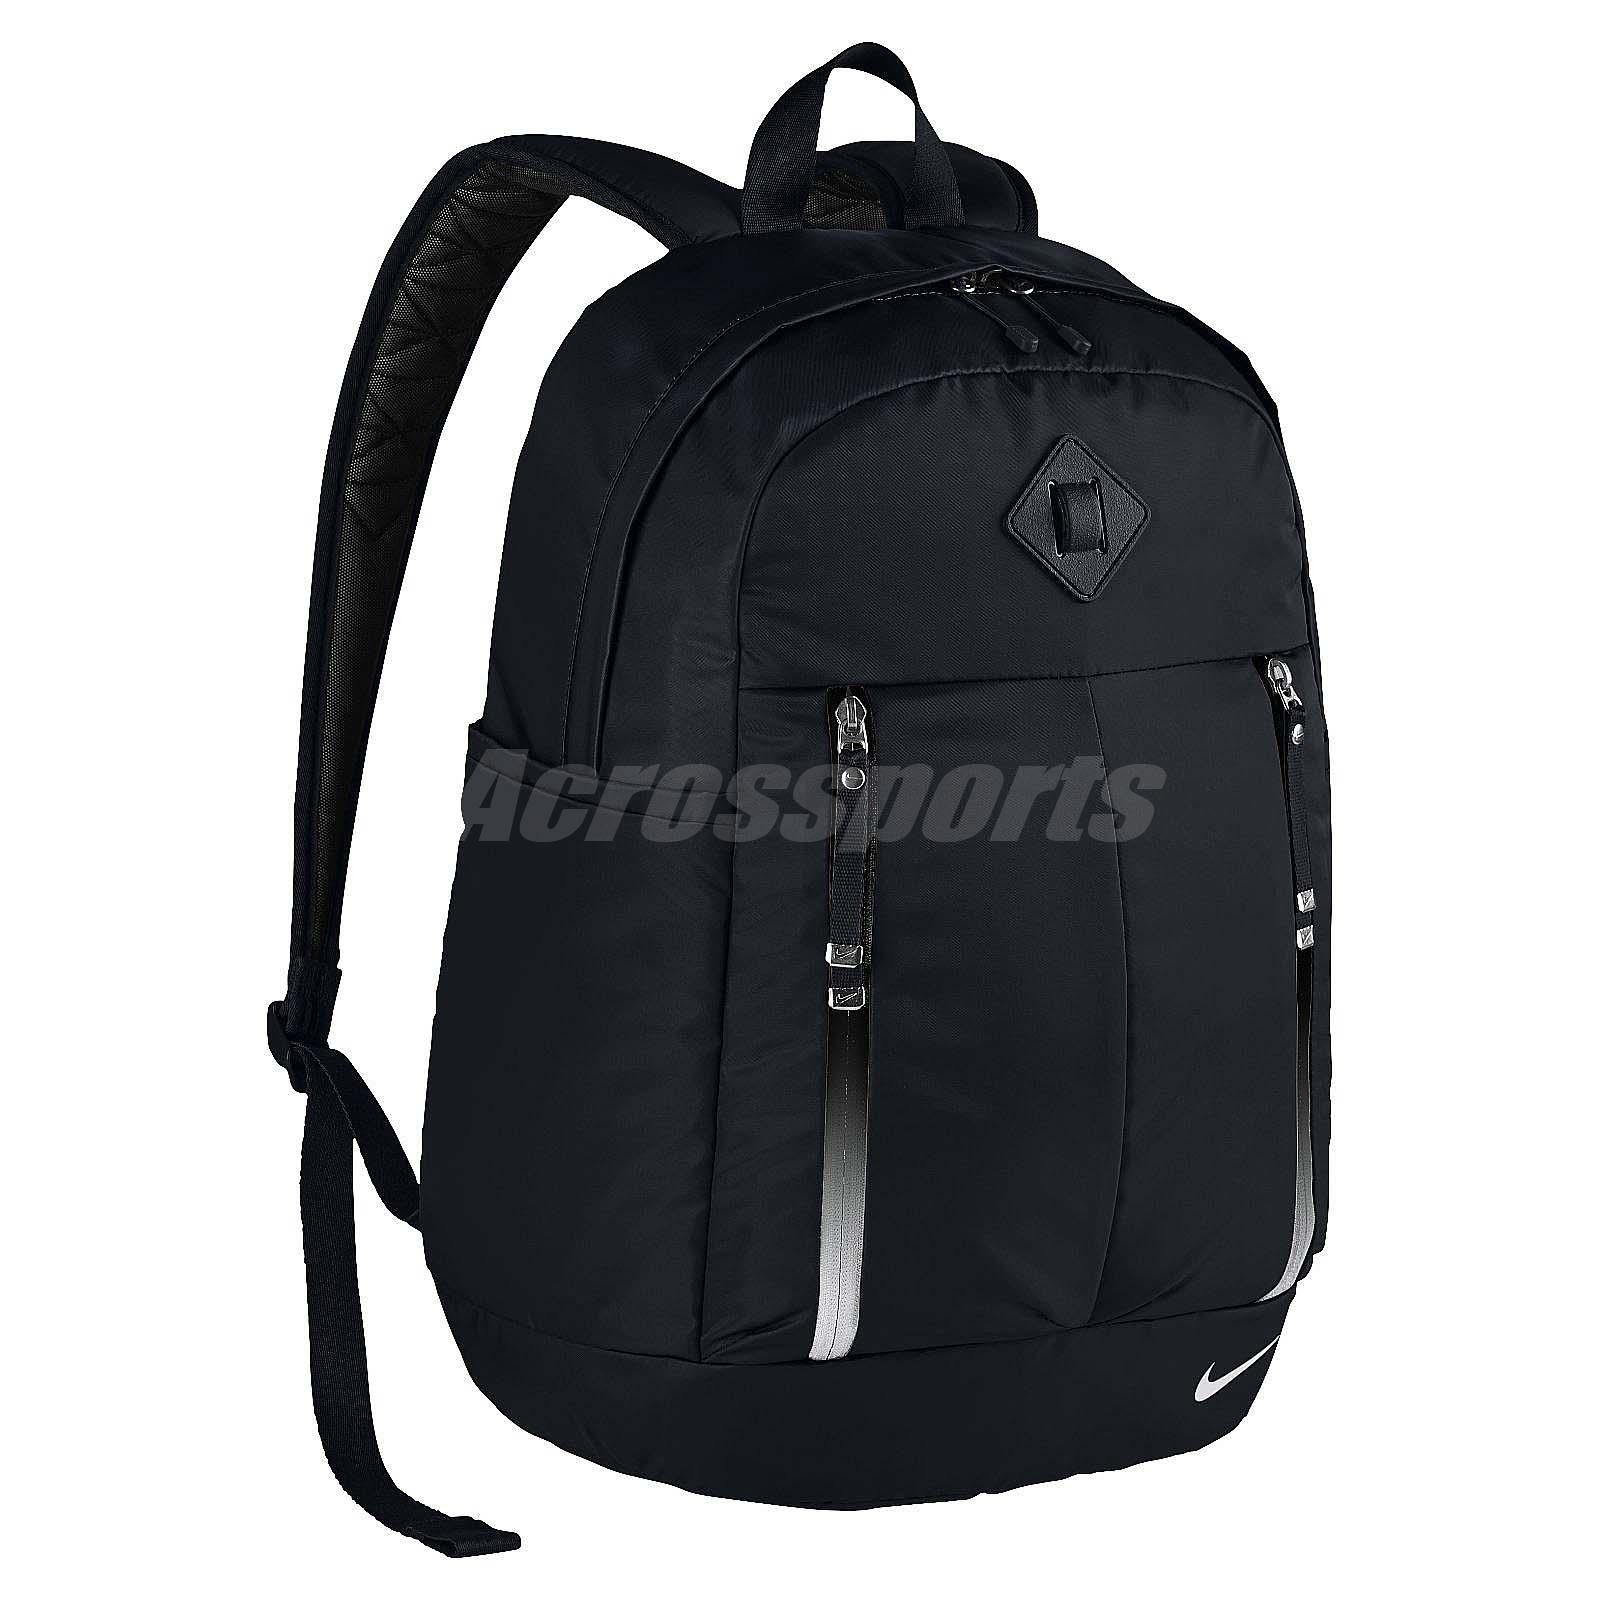 0b36869ab633 Details about Nike Auralux Black White Laptop Protect Training Backpack BP  Bag BA5241-010